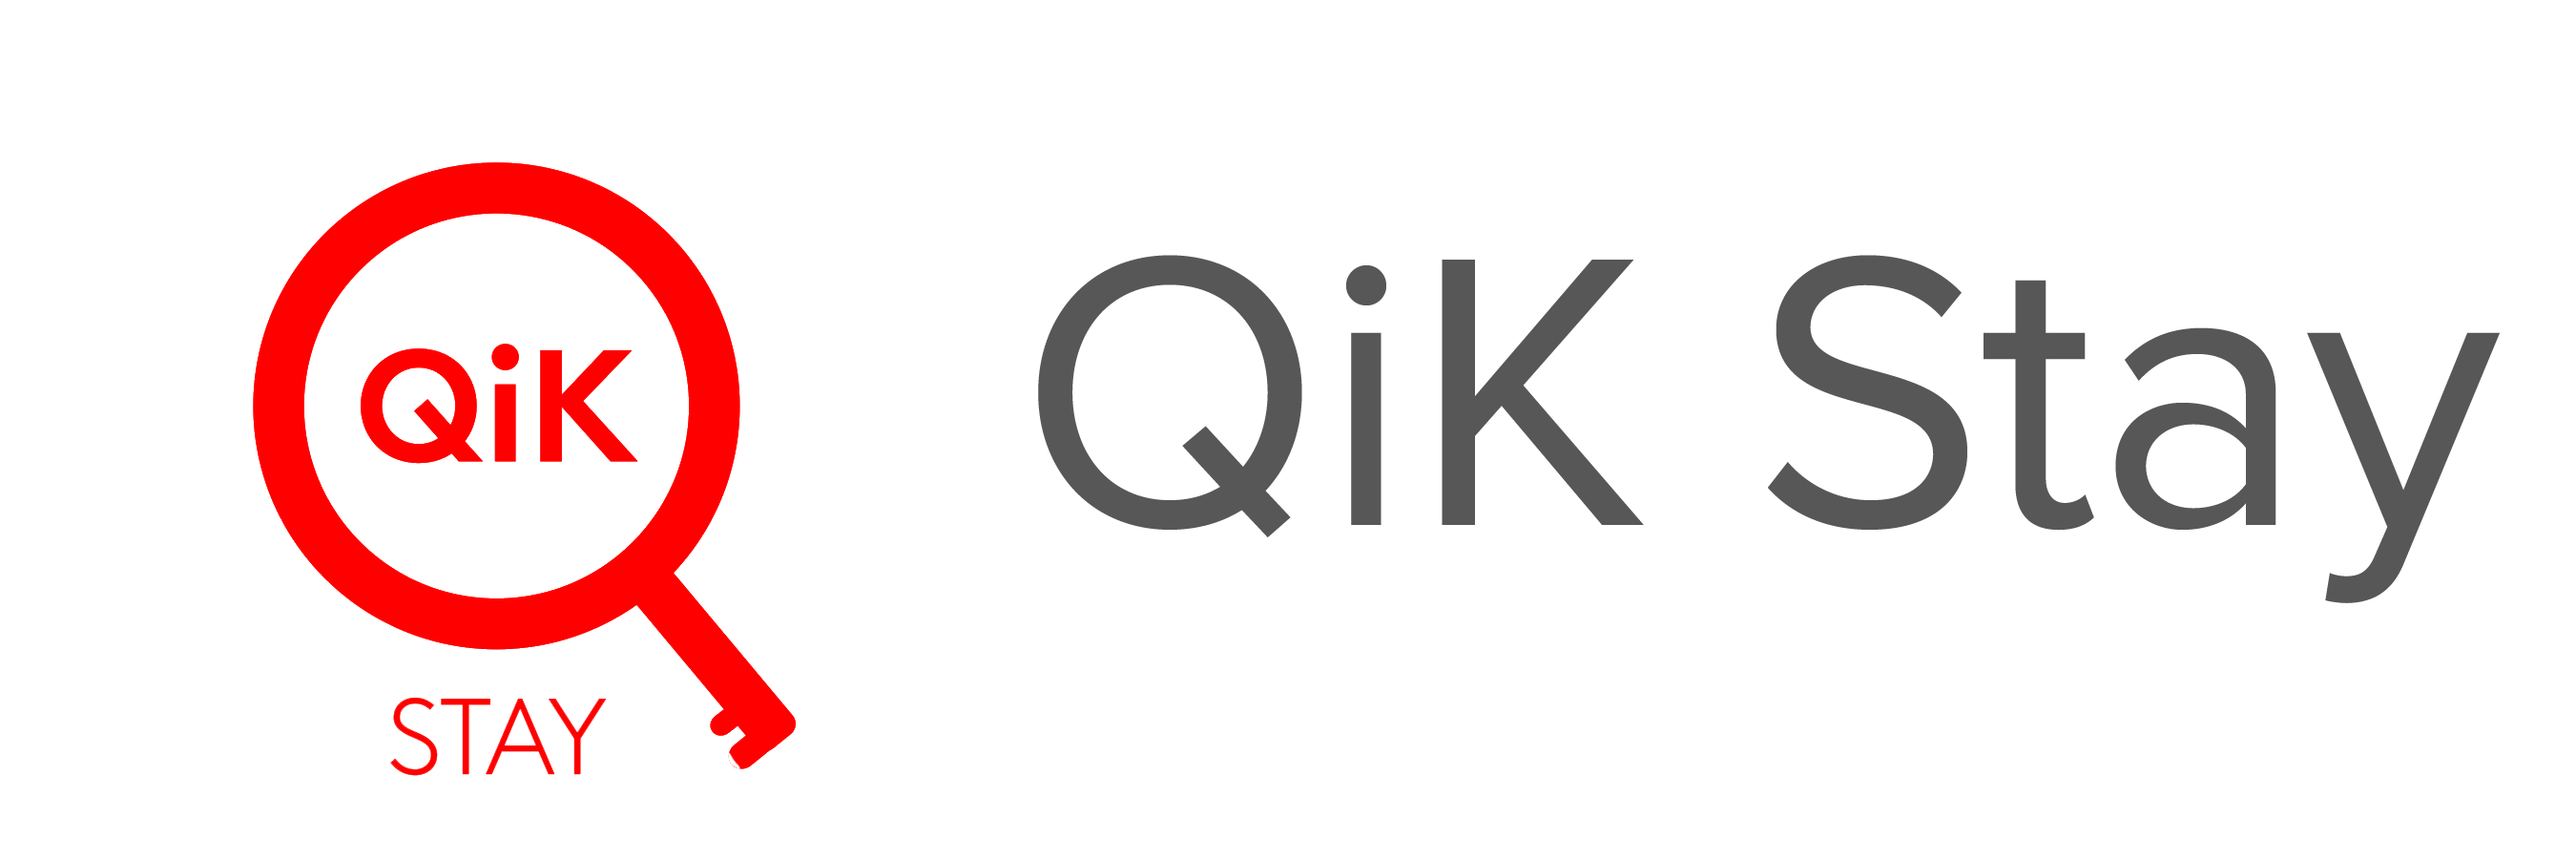 QiK Stay company logo